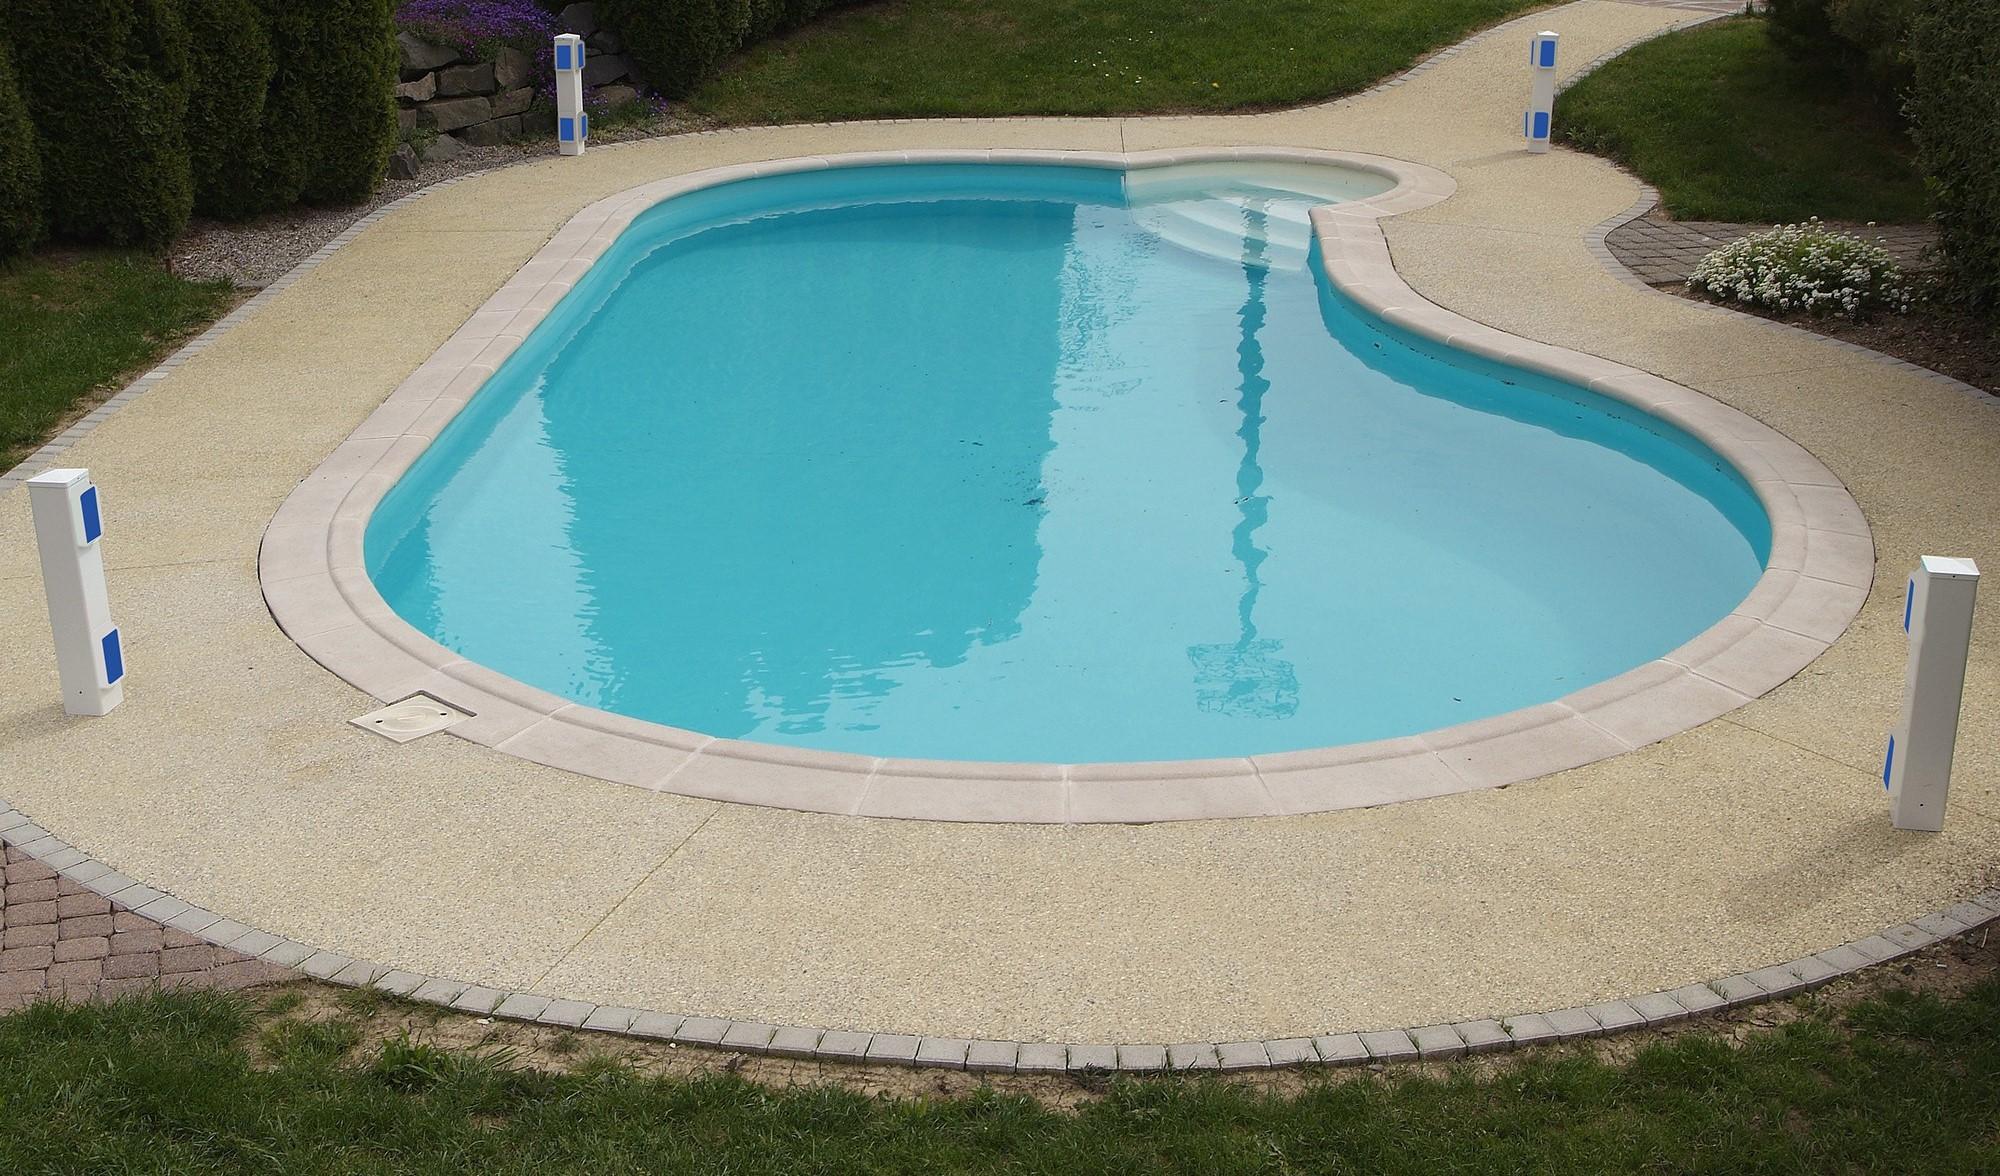 Alarma Perimetral para piscinas